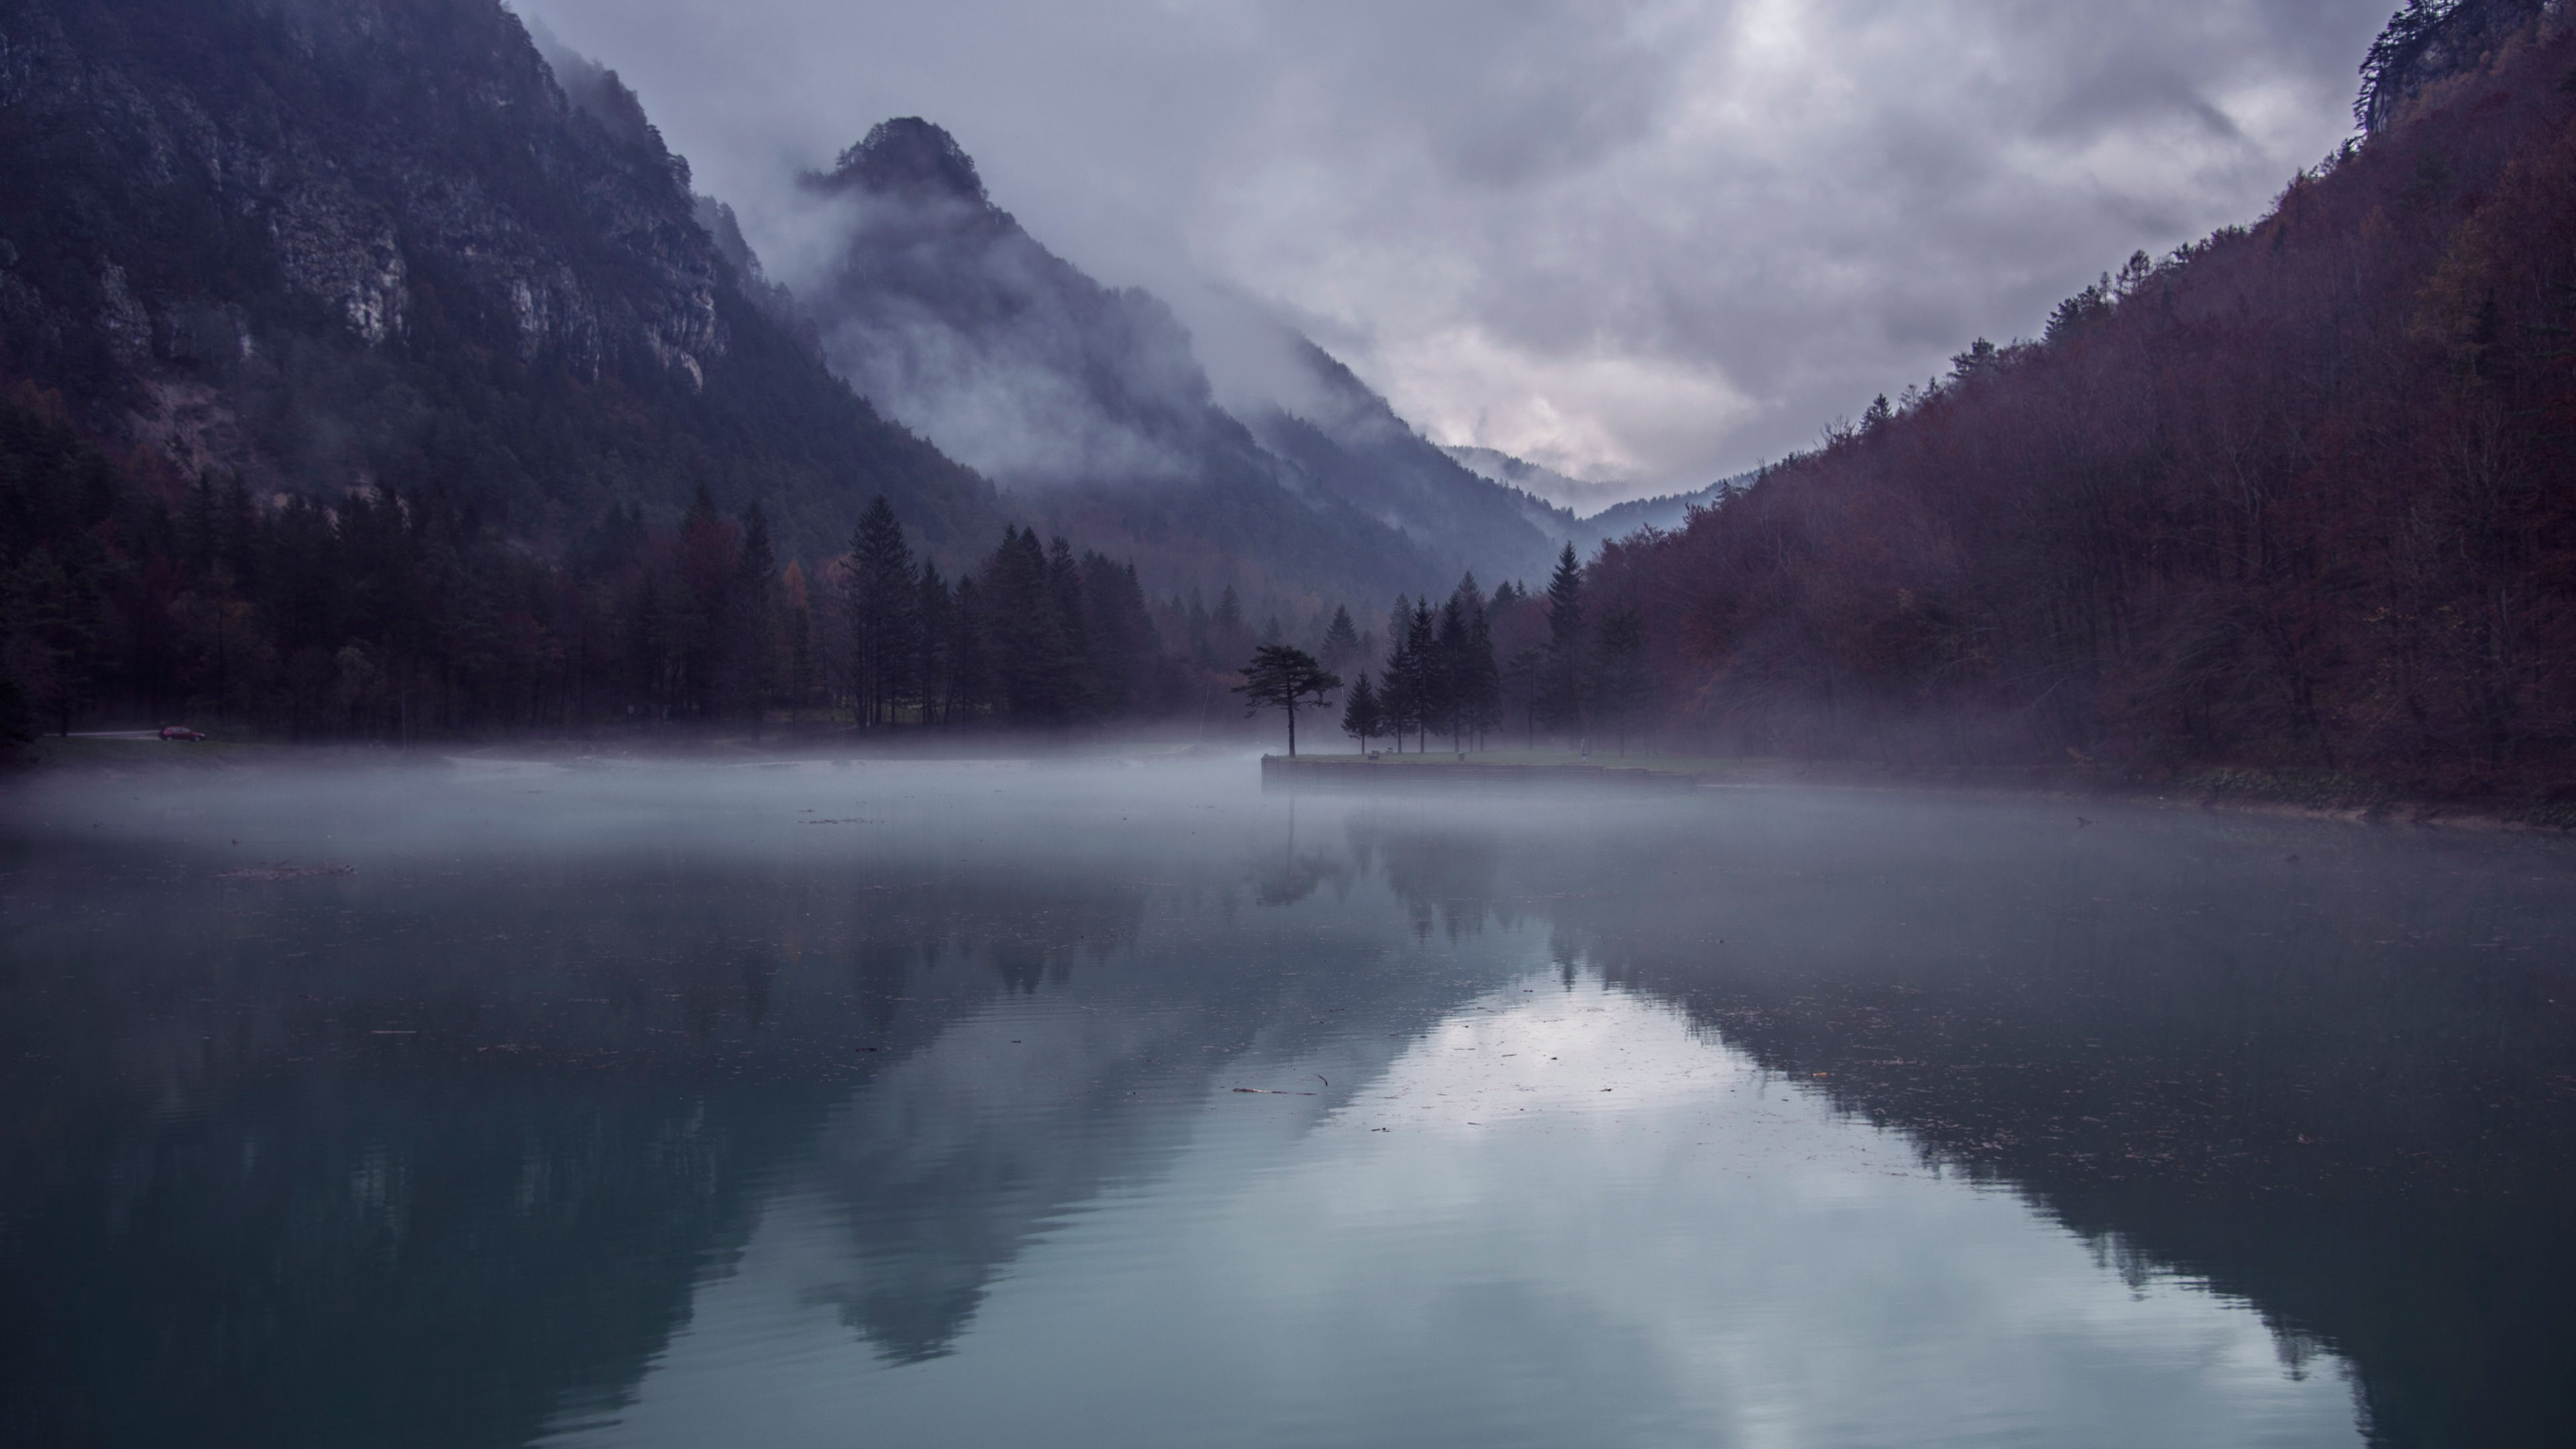 Mountain lake wallpaper mobile desktop background for Wallpaper photo